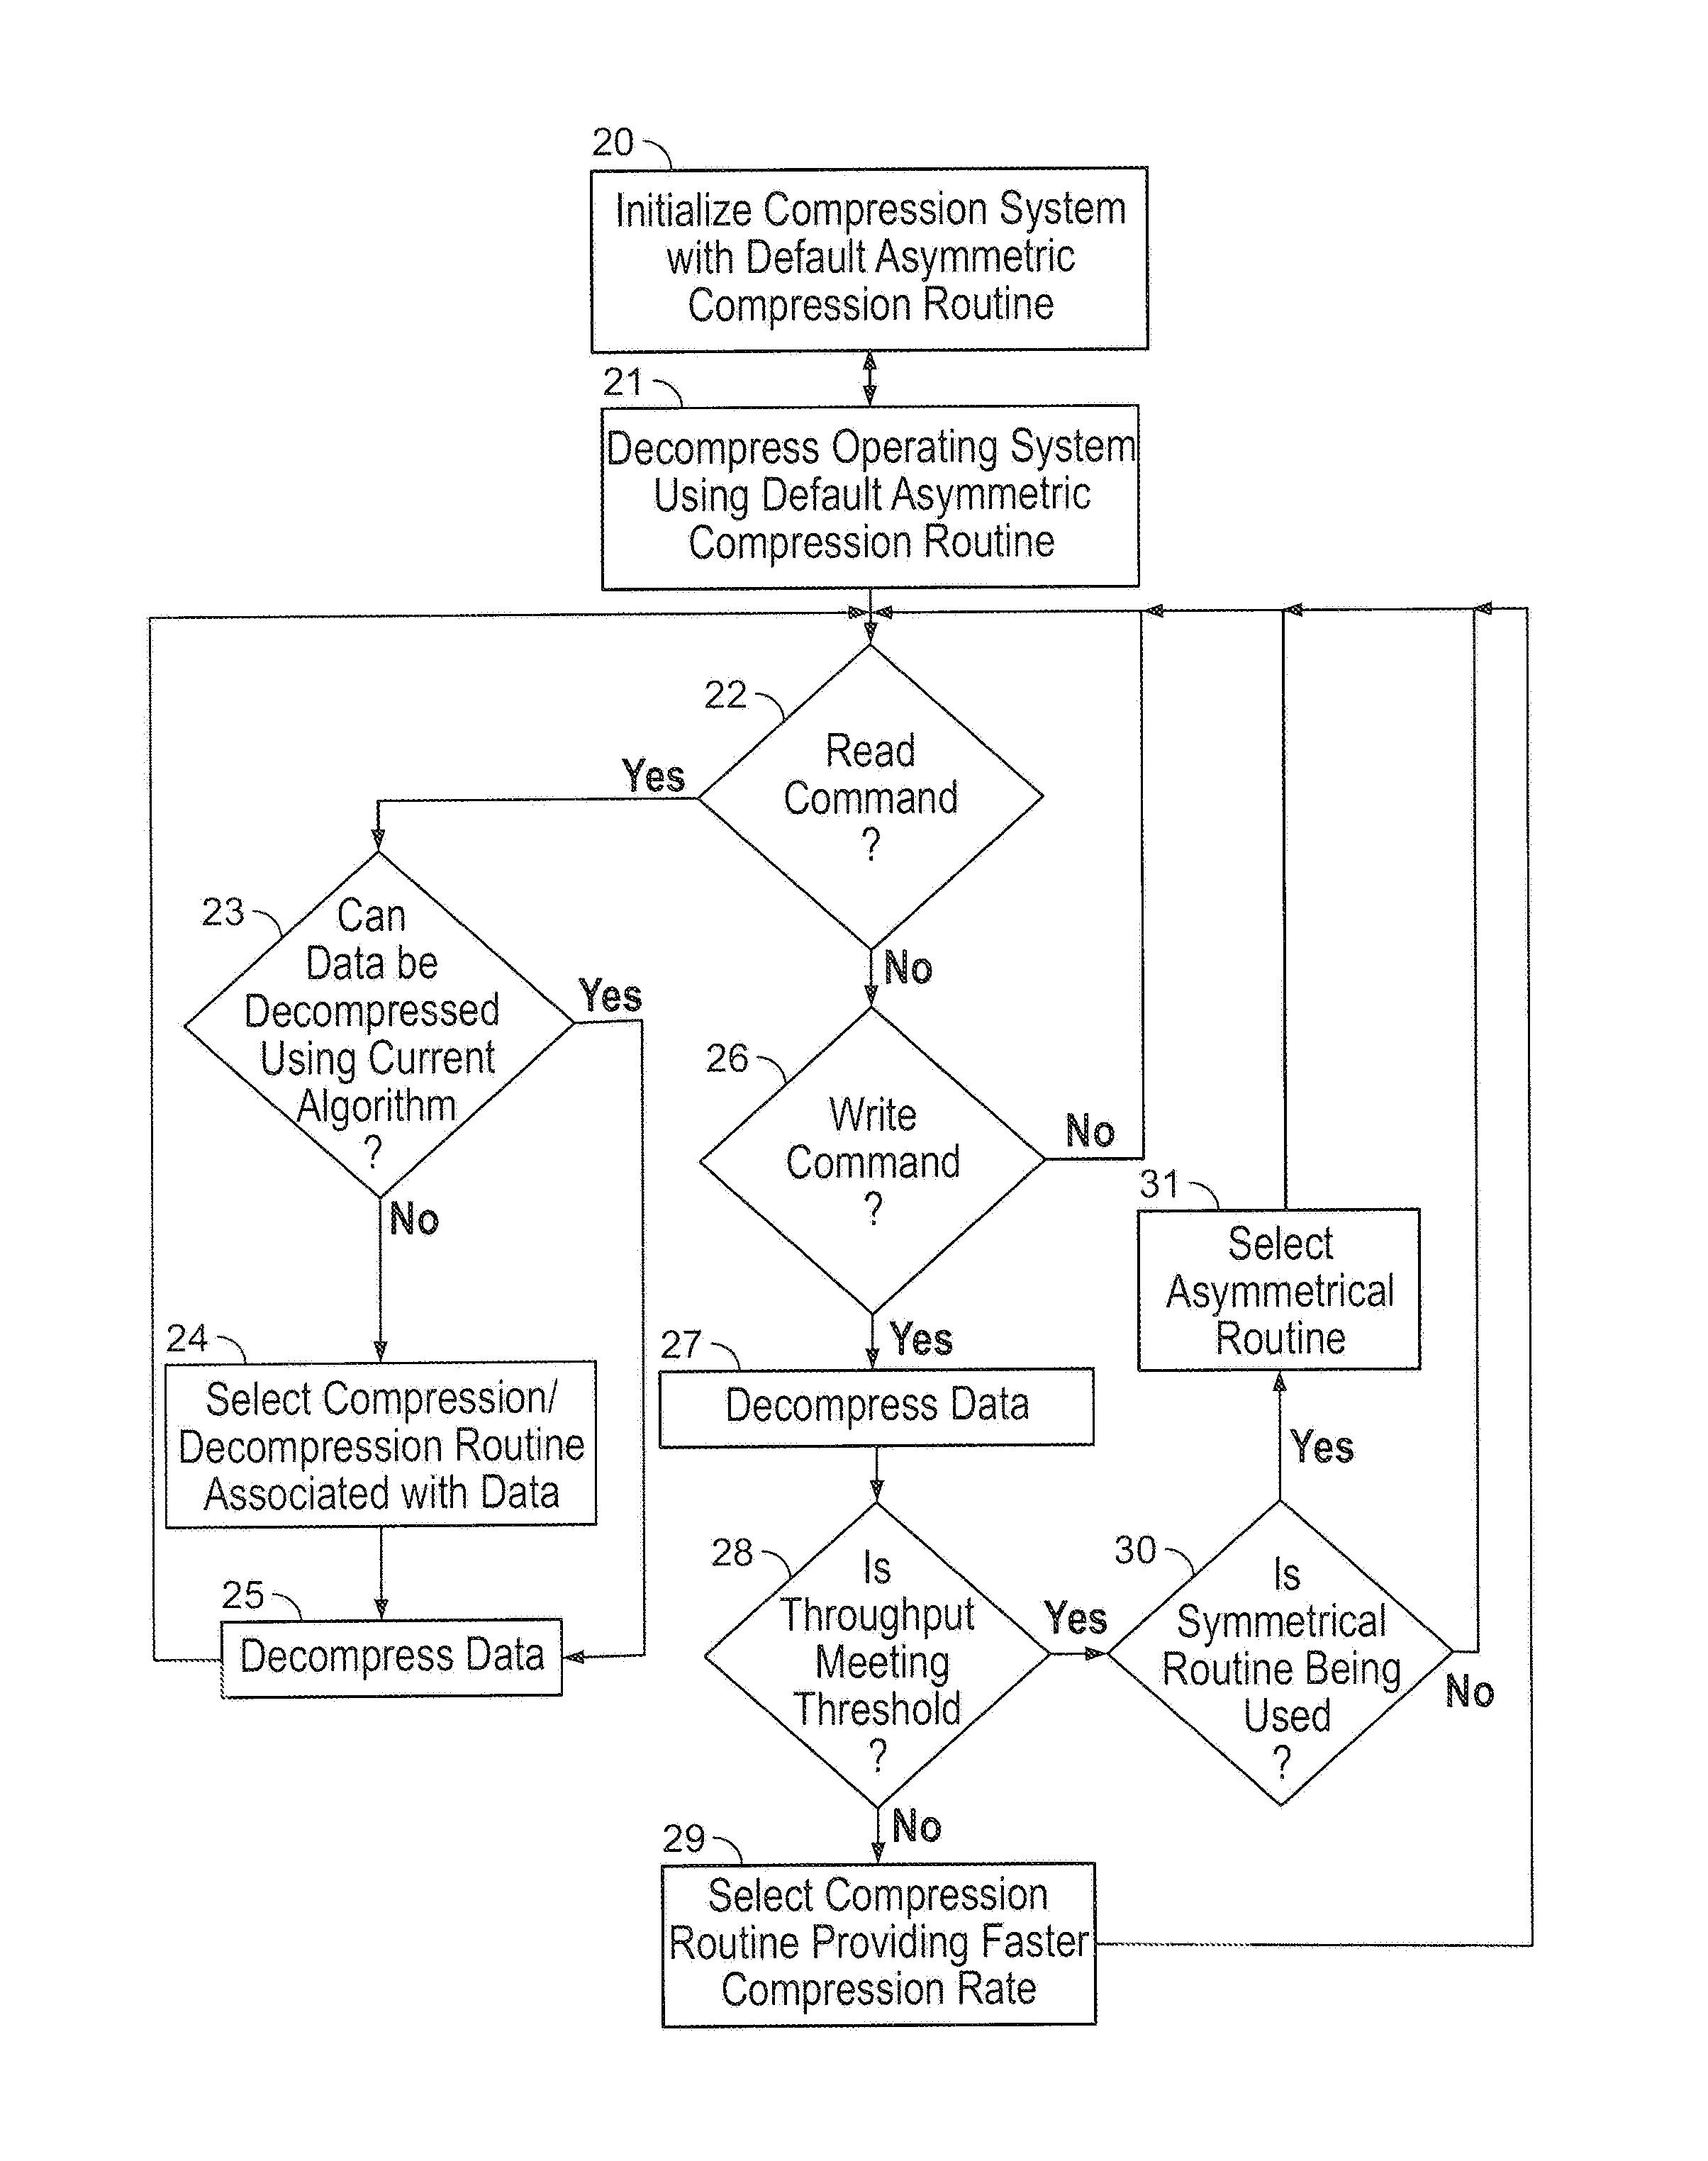 Patent US 9,762,907 B2